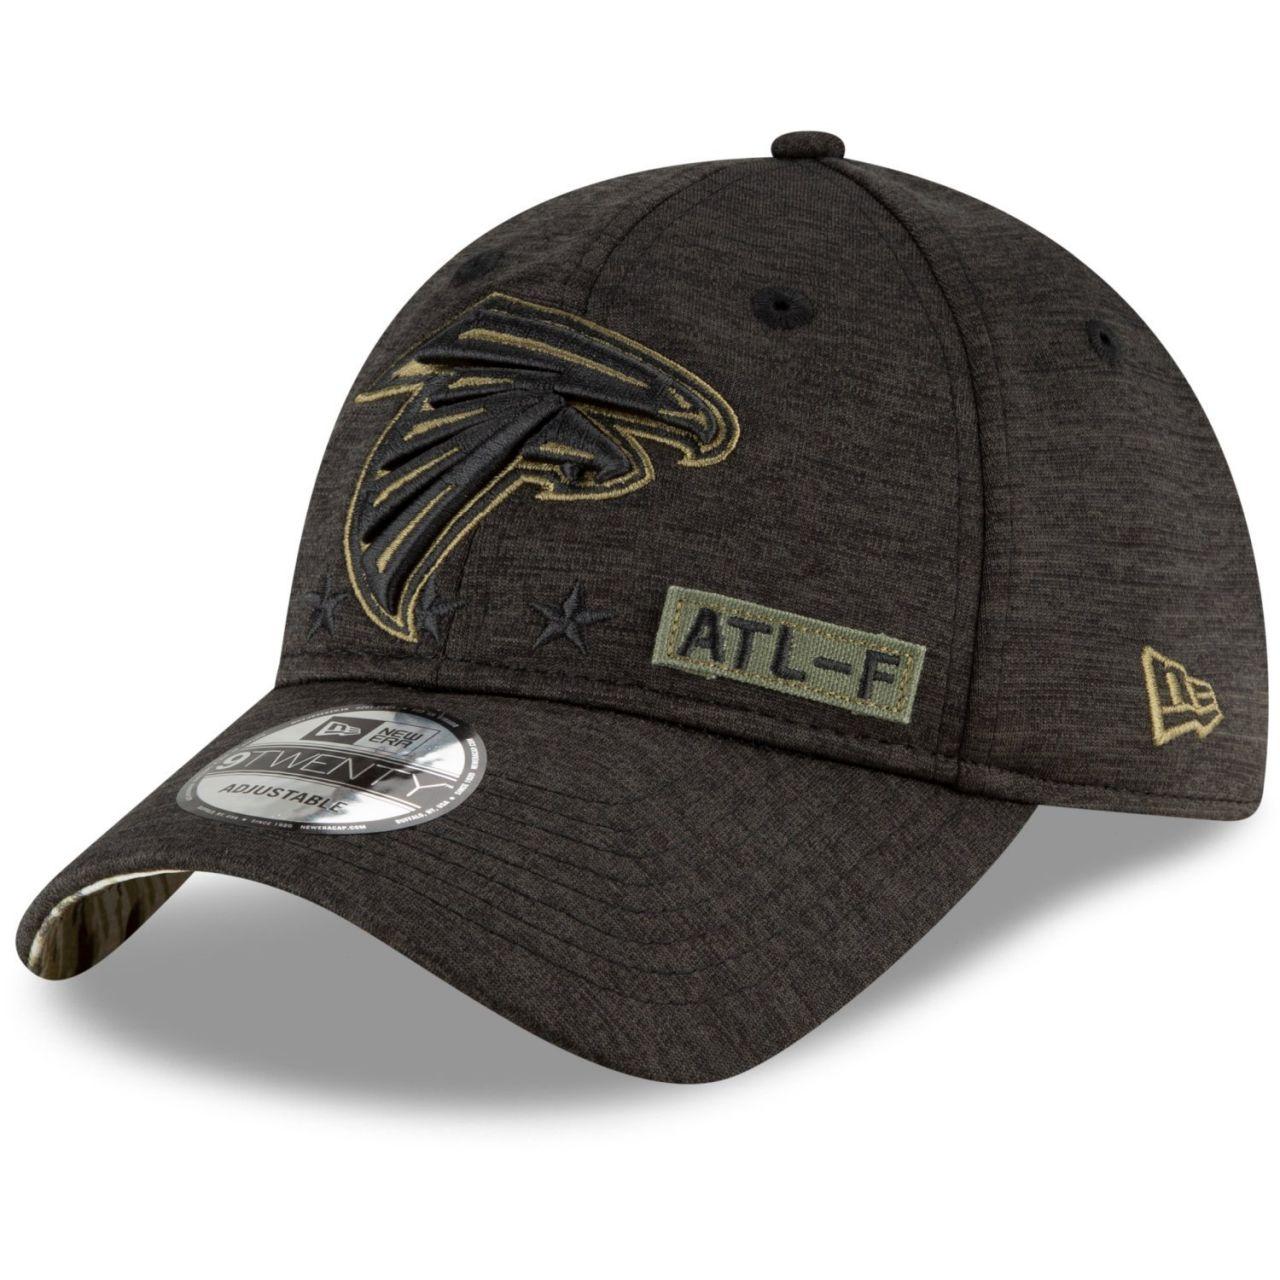 amfoo - New Era 9TWENTY Cap Salute to Service Atlanta Falcons